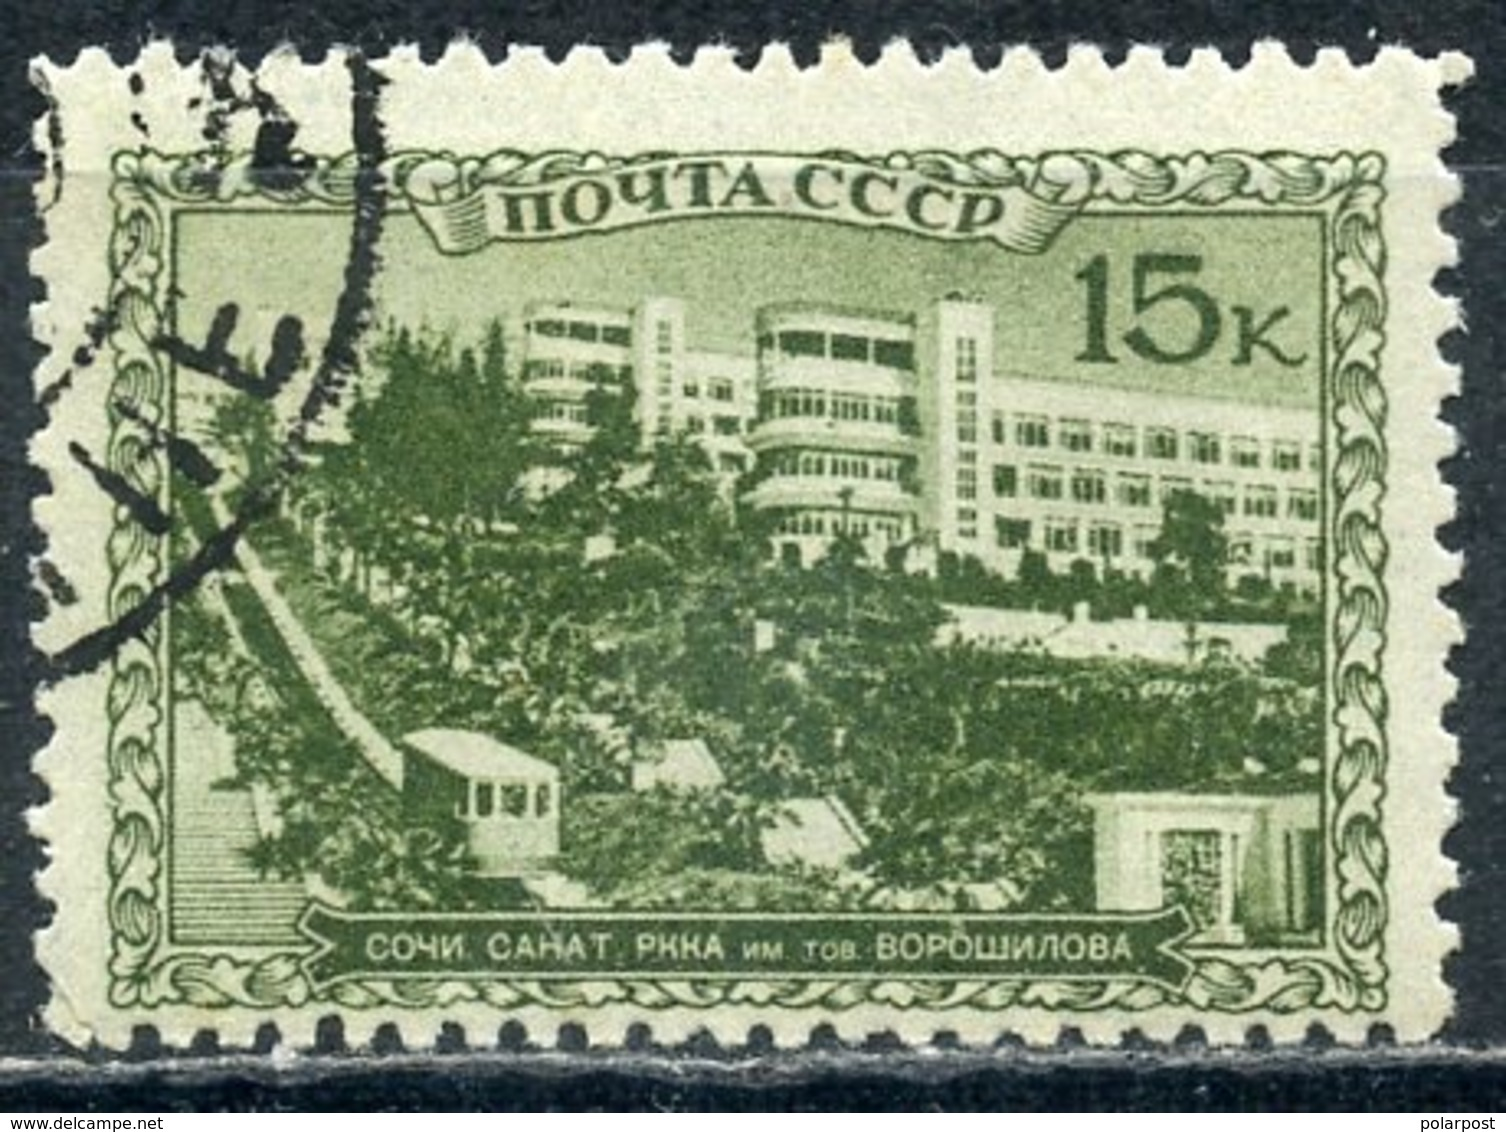 Y85 USSR 1939 615 (708) RESORTS OF THE USSR. Sochi. Sanatorium Of The Red Army Named After Comrade Voroshilov - 1923-1991 UdSSR